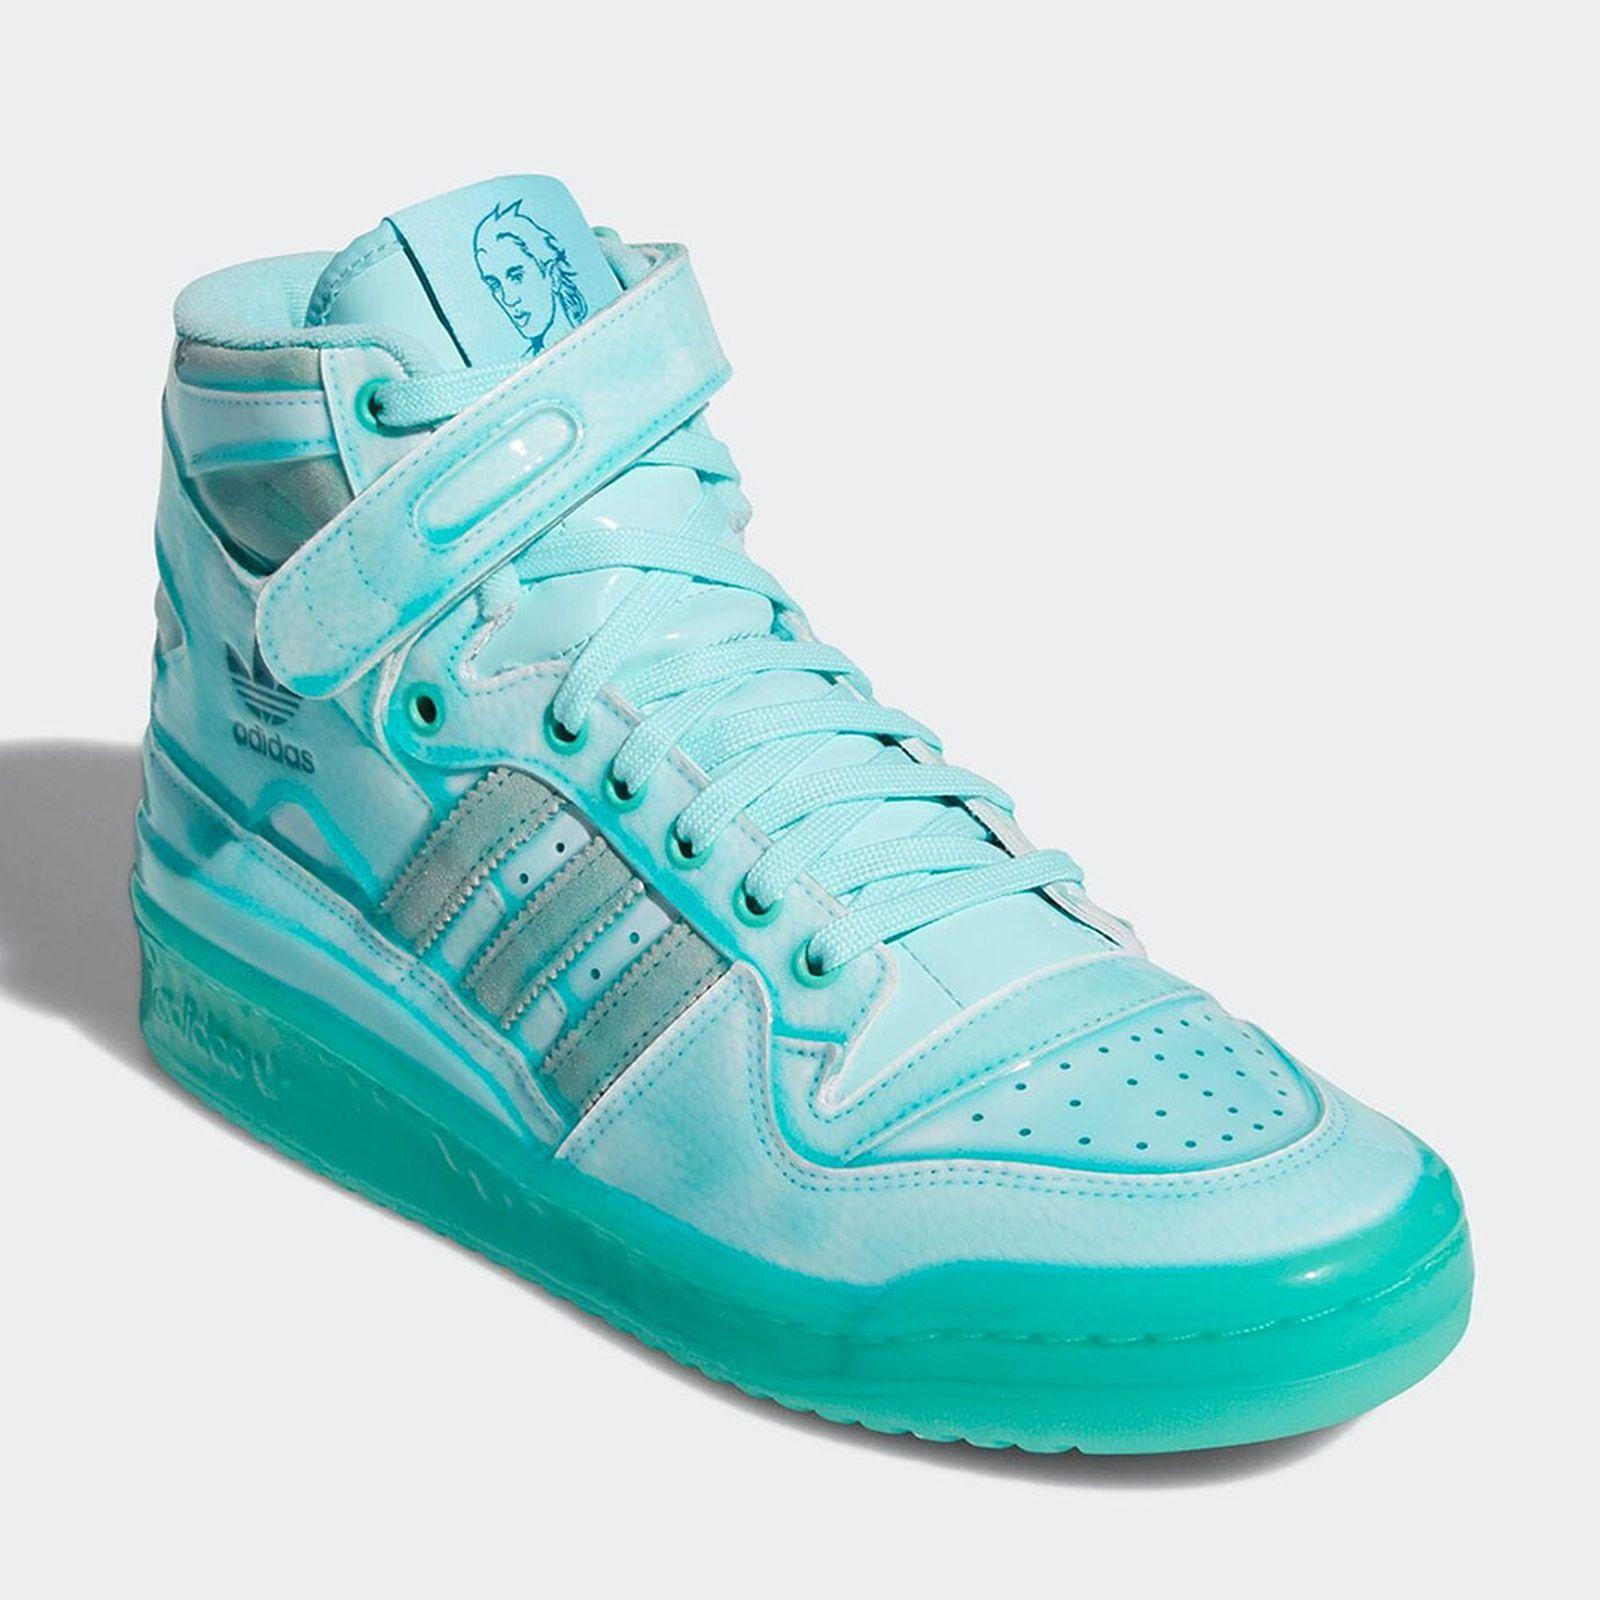 jeremy-scott-adidas-forum-hi-release-date-price-10